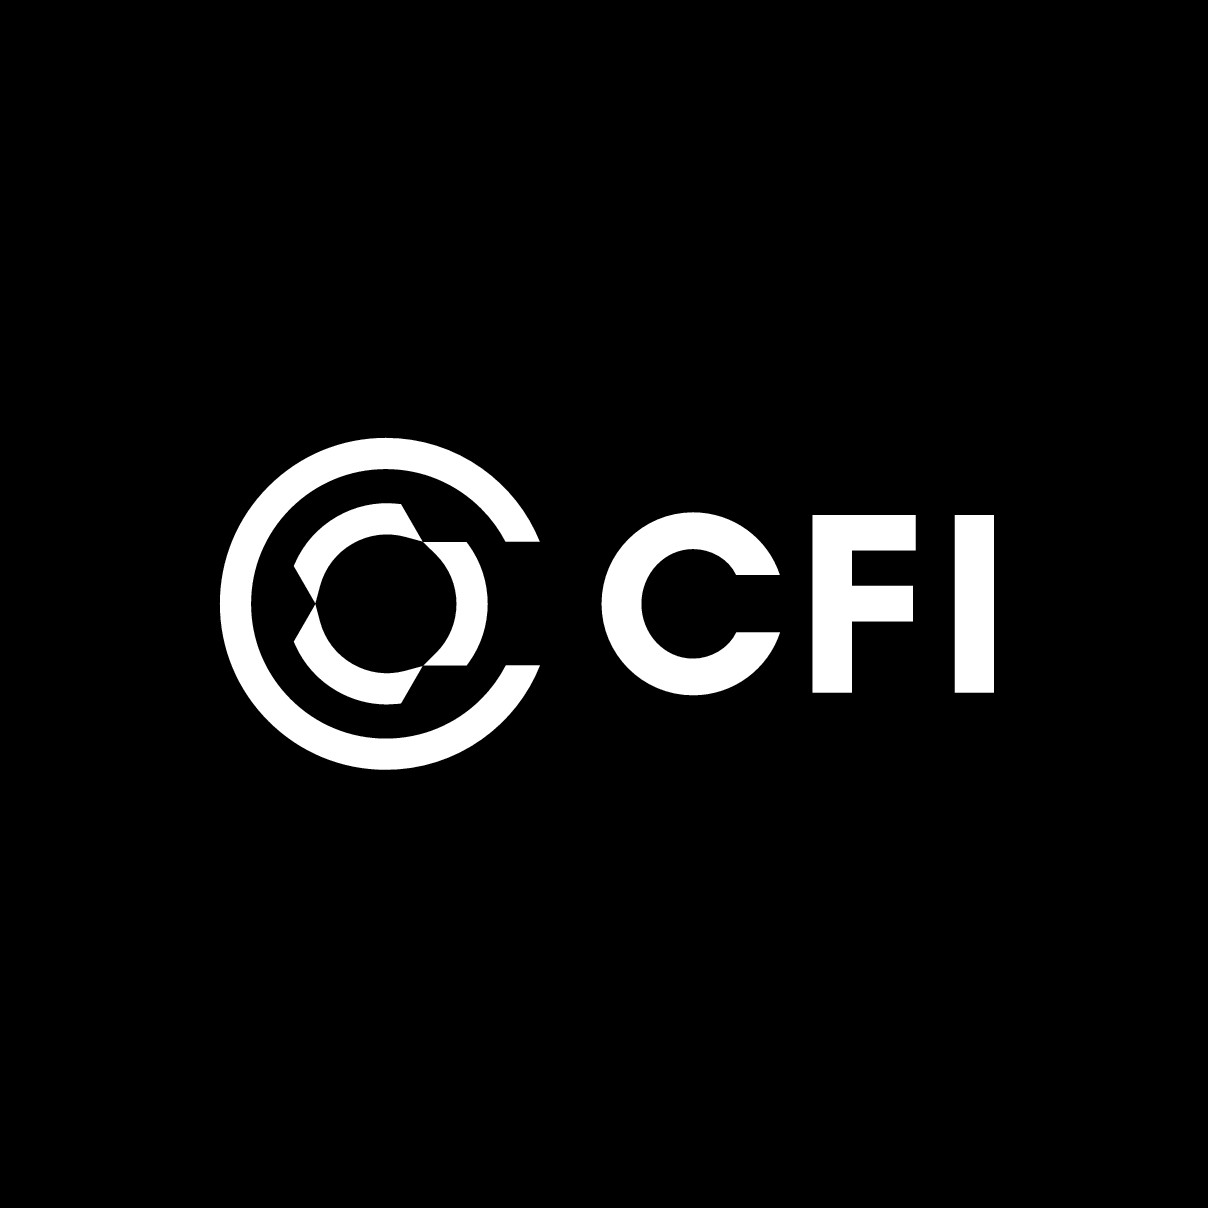 CFI logo and brand identity pack